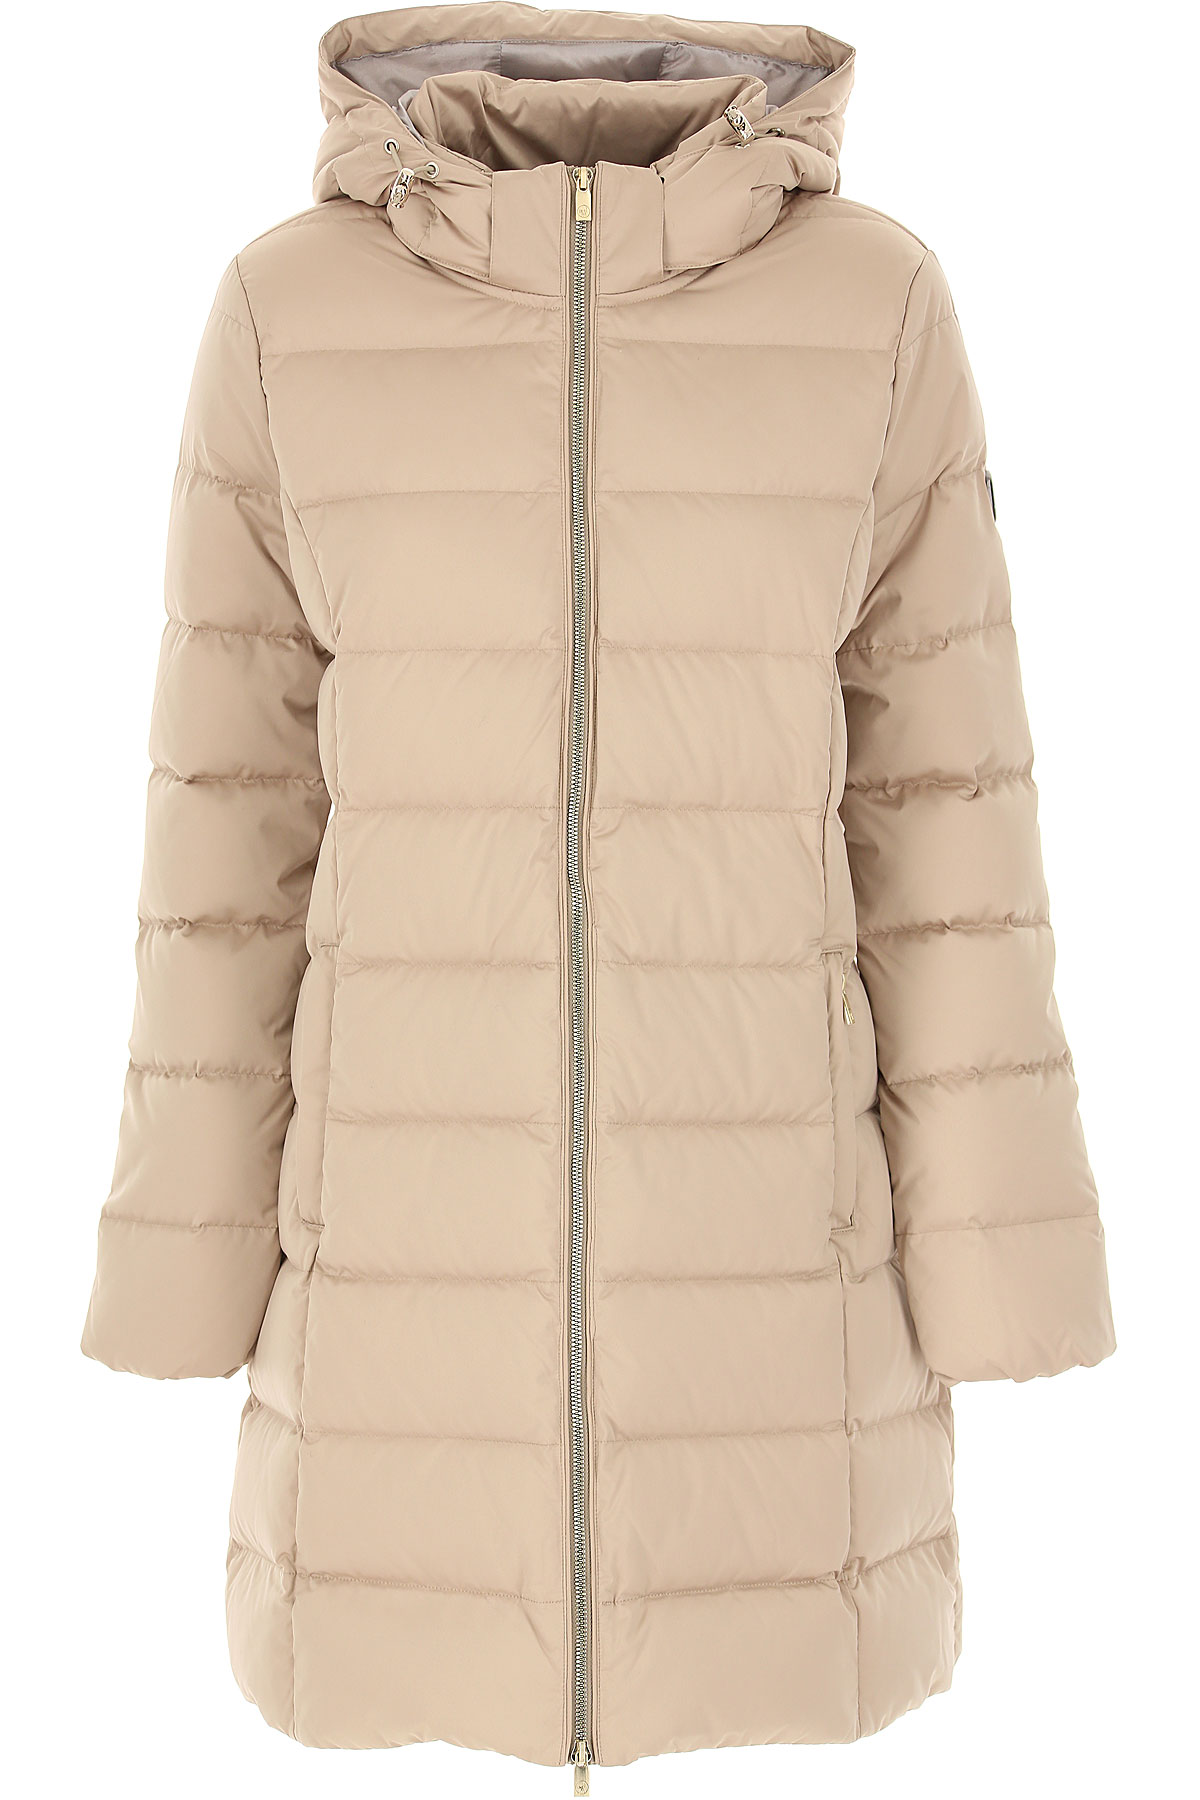 Ciesse Piumini Down Jacket for Women, Puffer Ski Jacket On Sale, Ecru, Down, 2019, 10 4 6 8